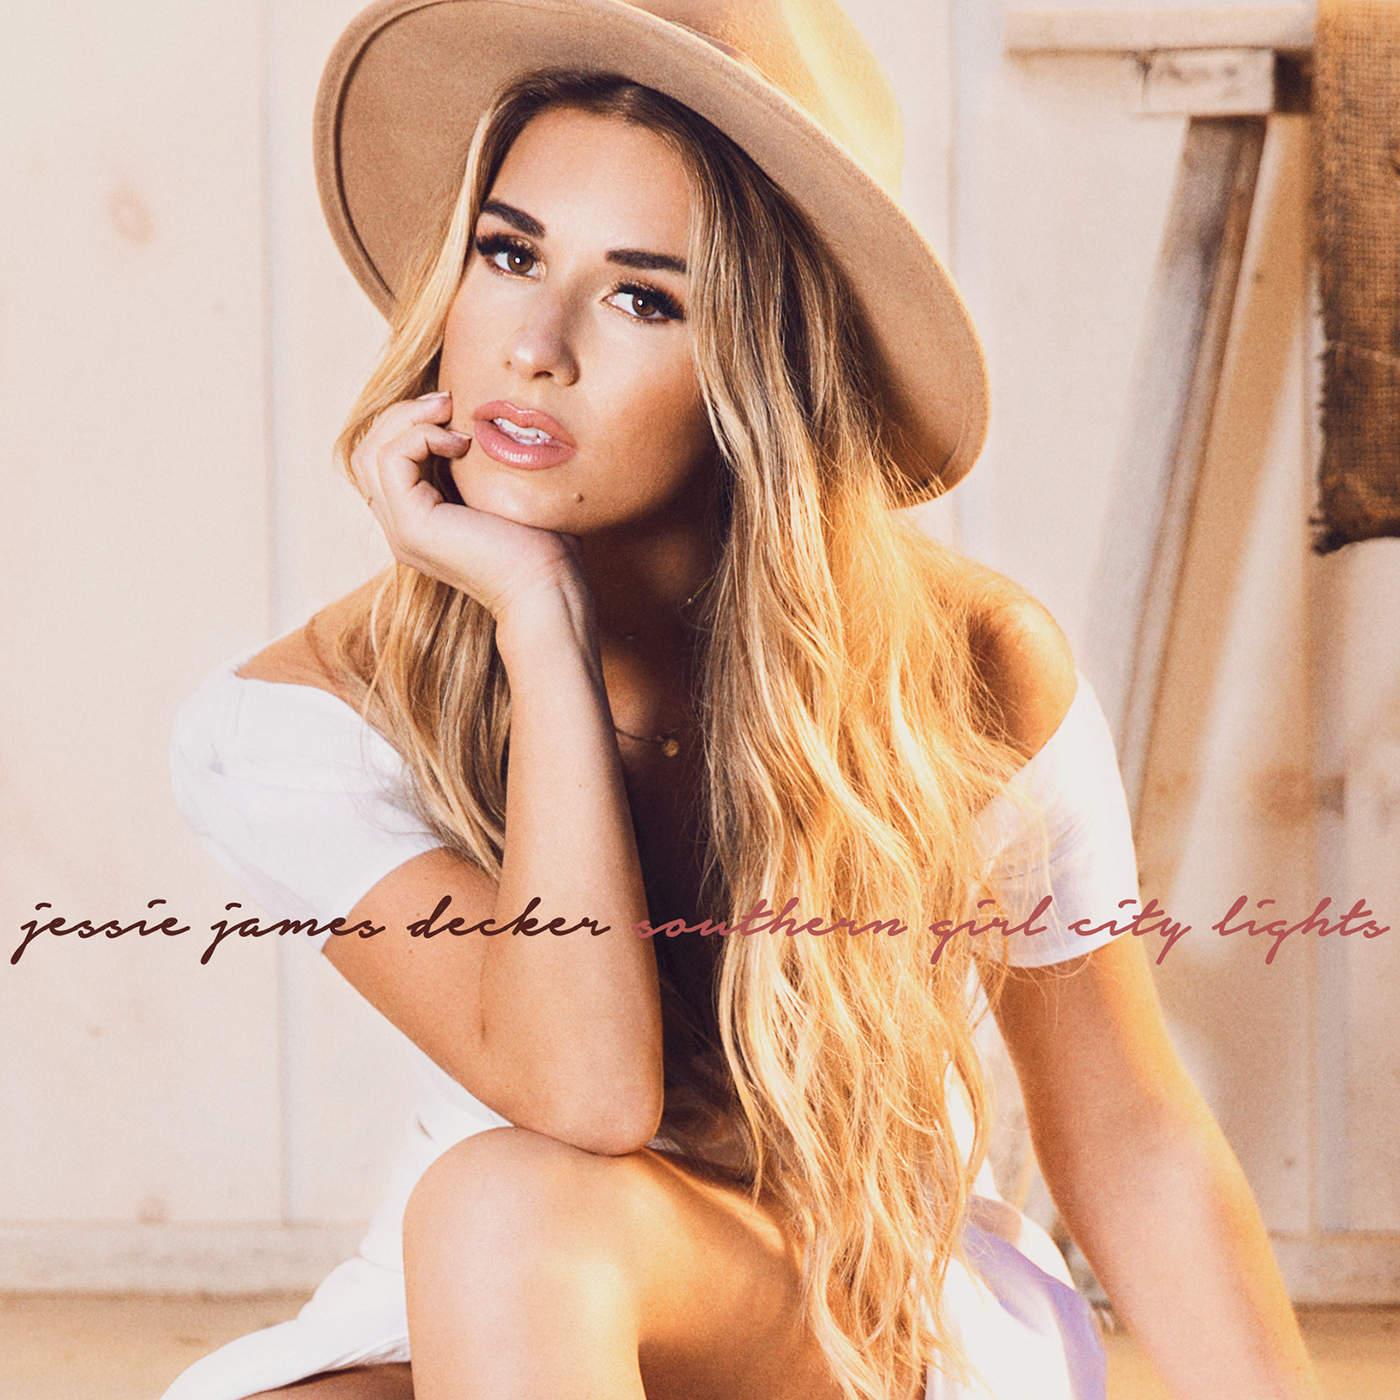 Southern Girl City Lights - Jessie James Decker